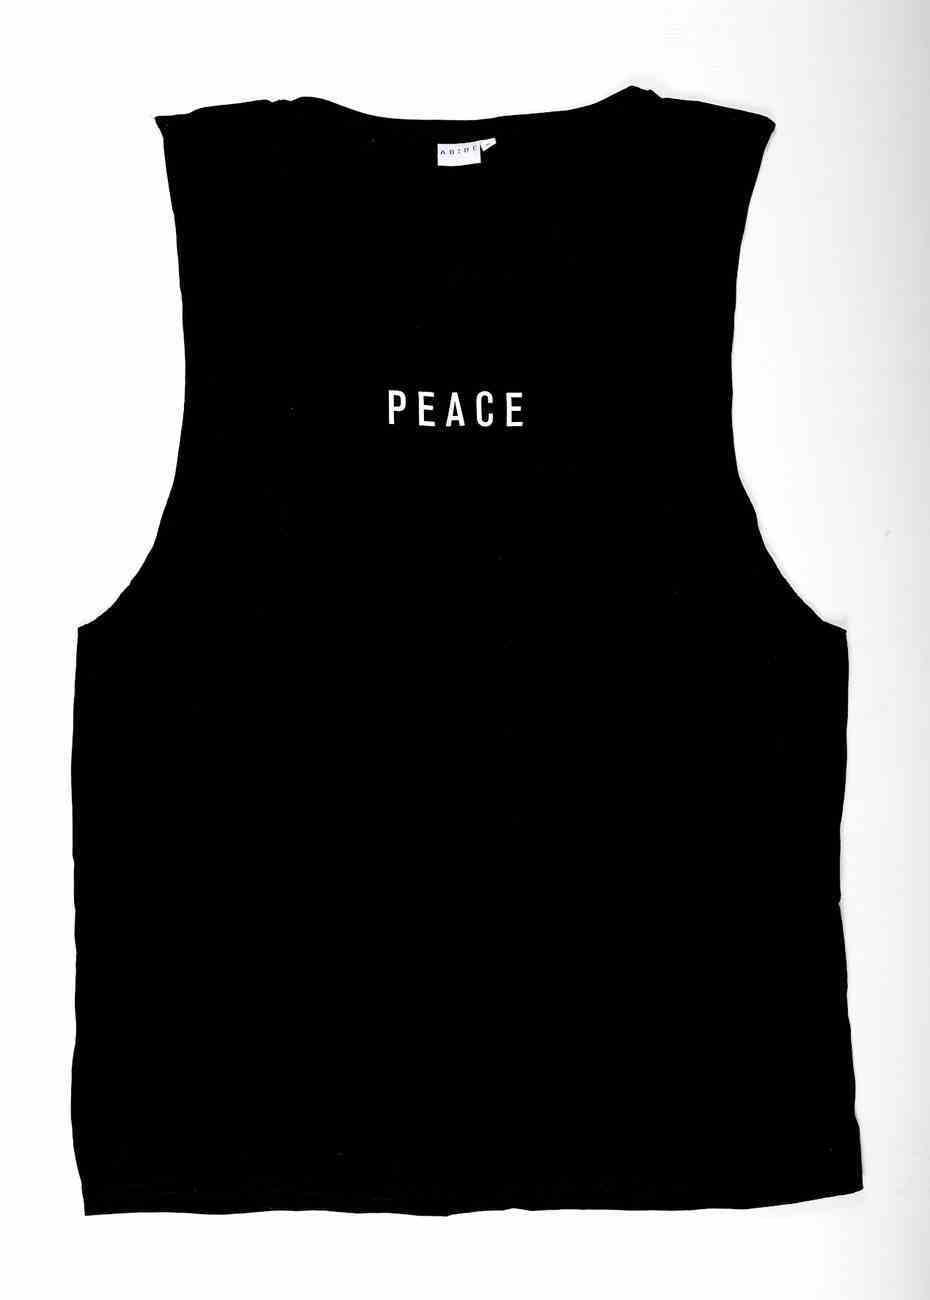 Mens Barnard Tank: Peace, Large, Black With White Print (Abide T-shirt Apparel Series) Soft Goods